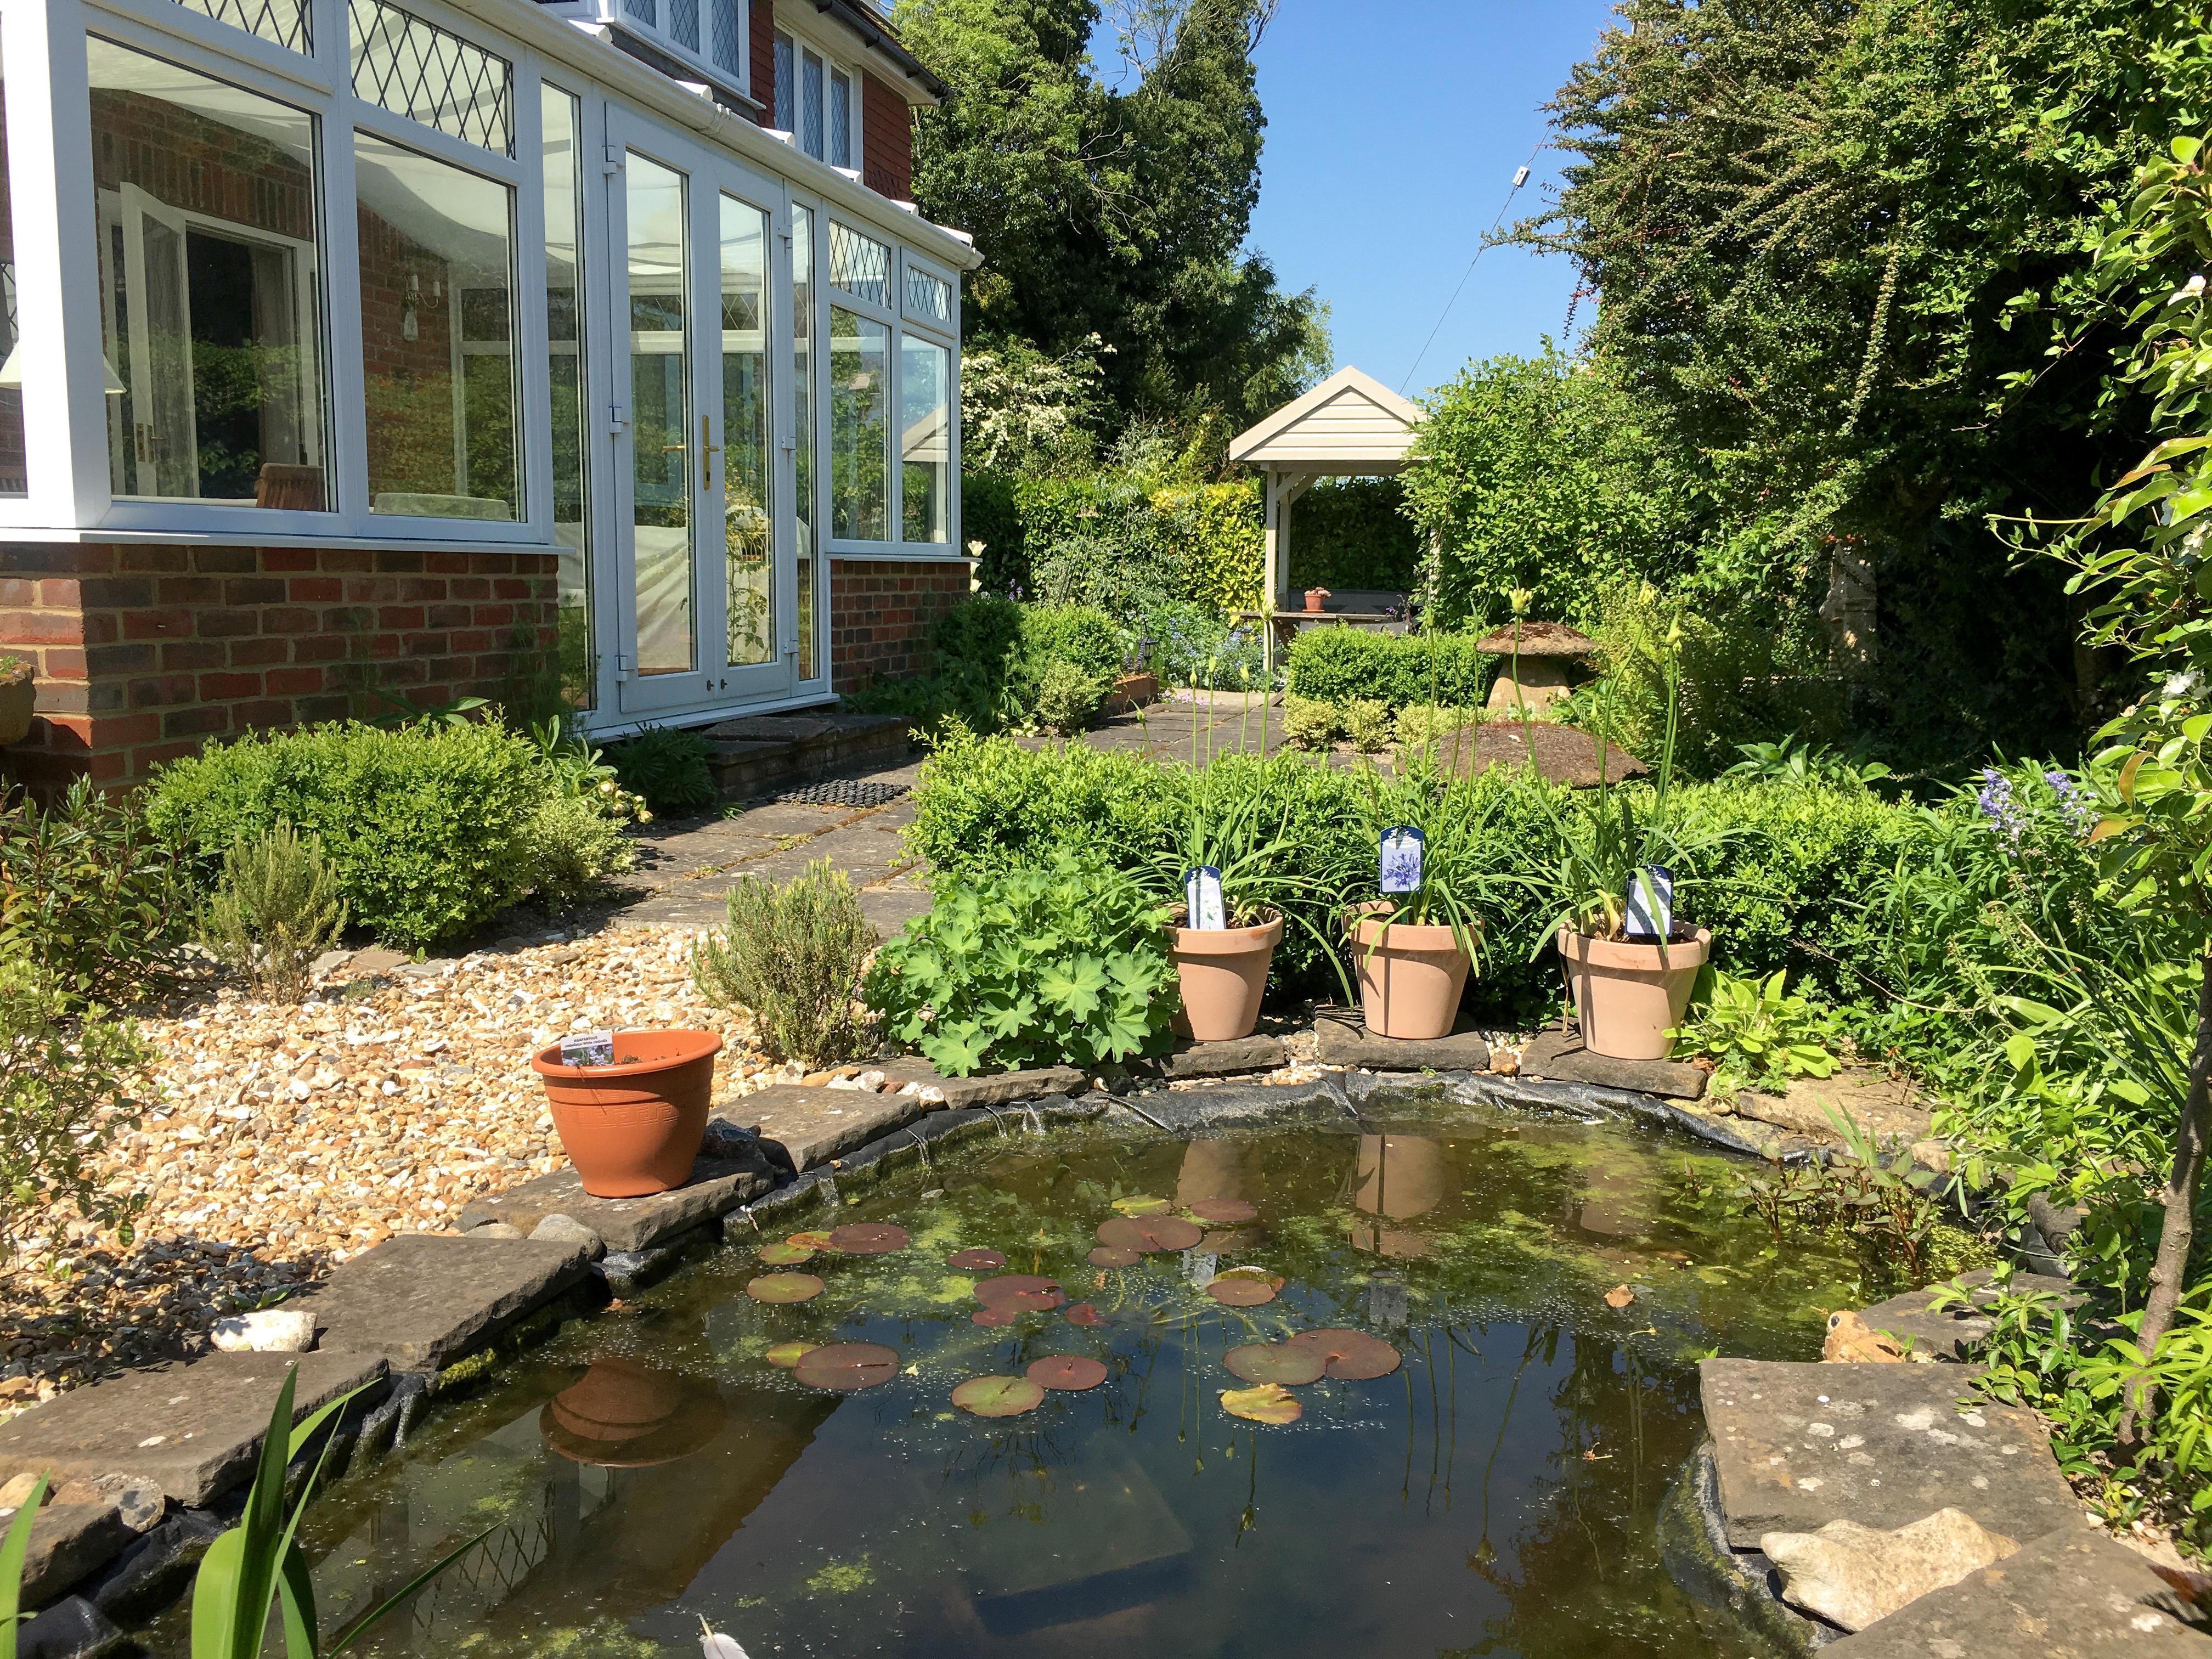 Case Study - Garden Redesign | My Home Extension